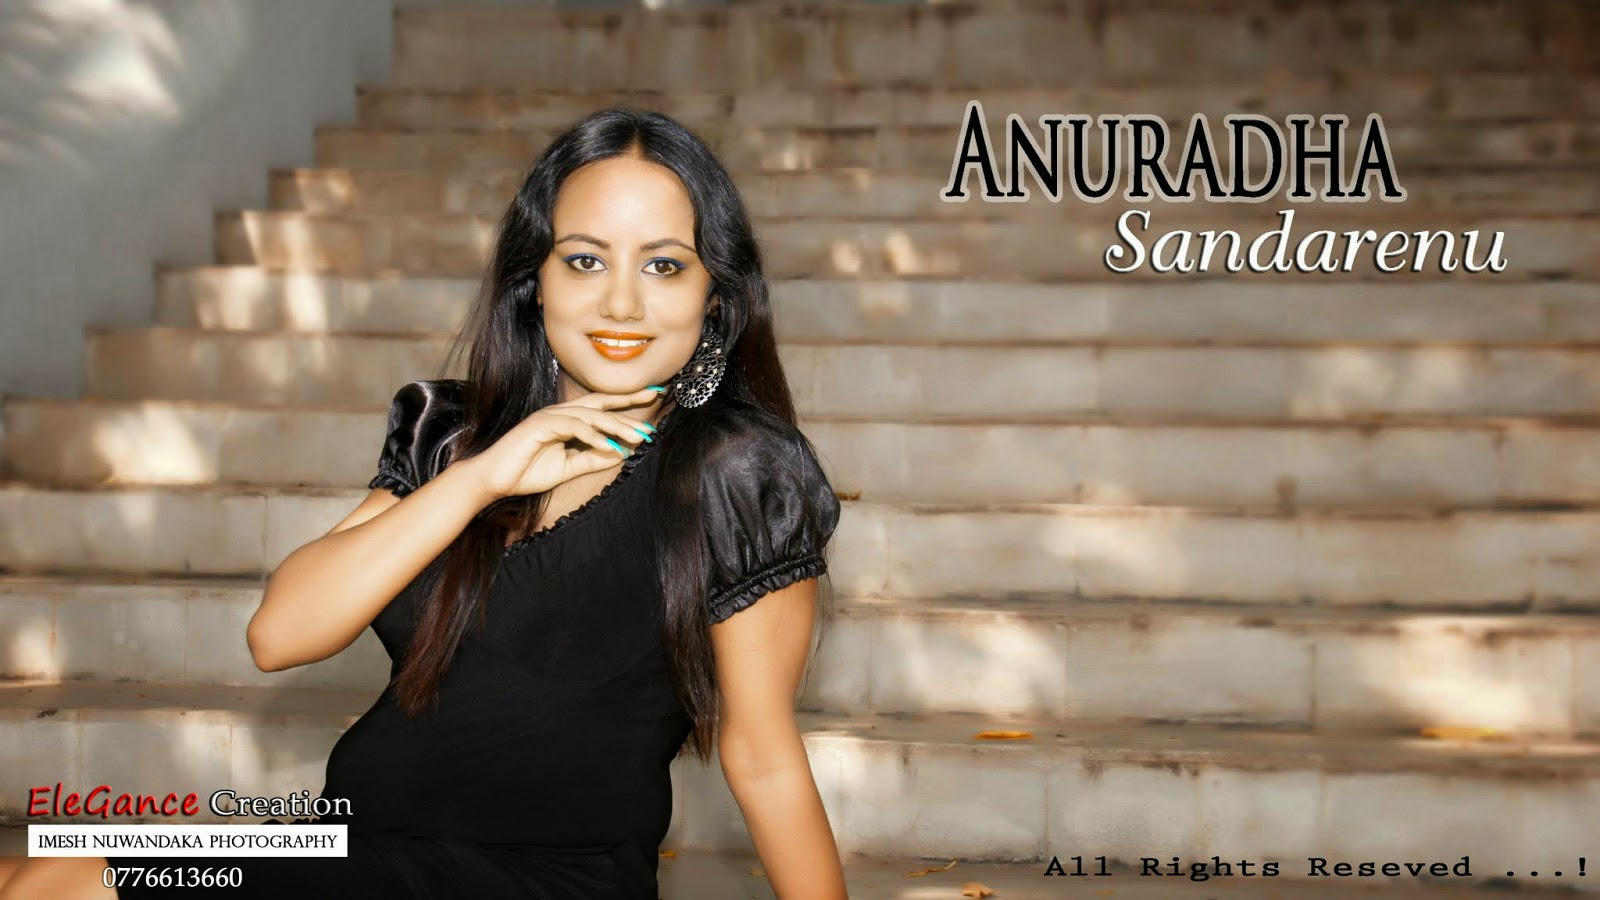 ANURADHA SANDARENU